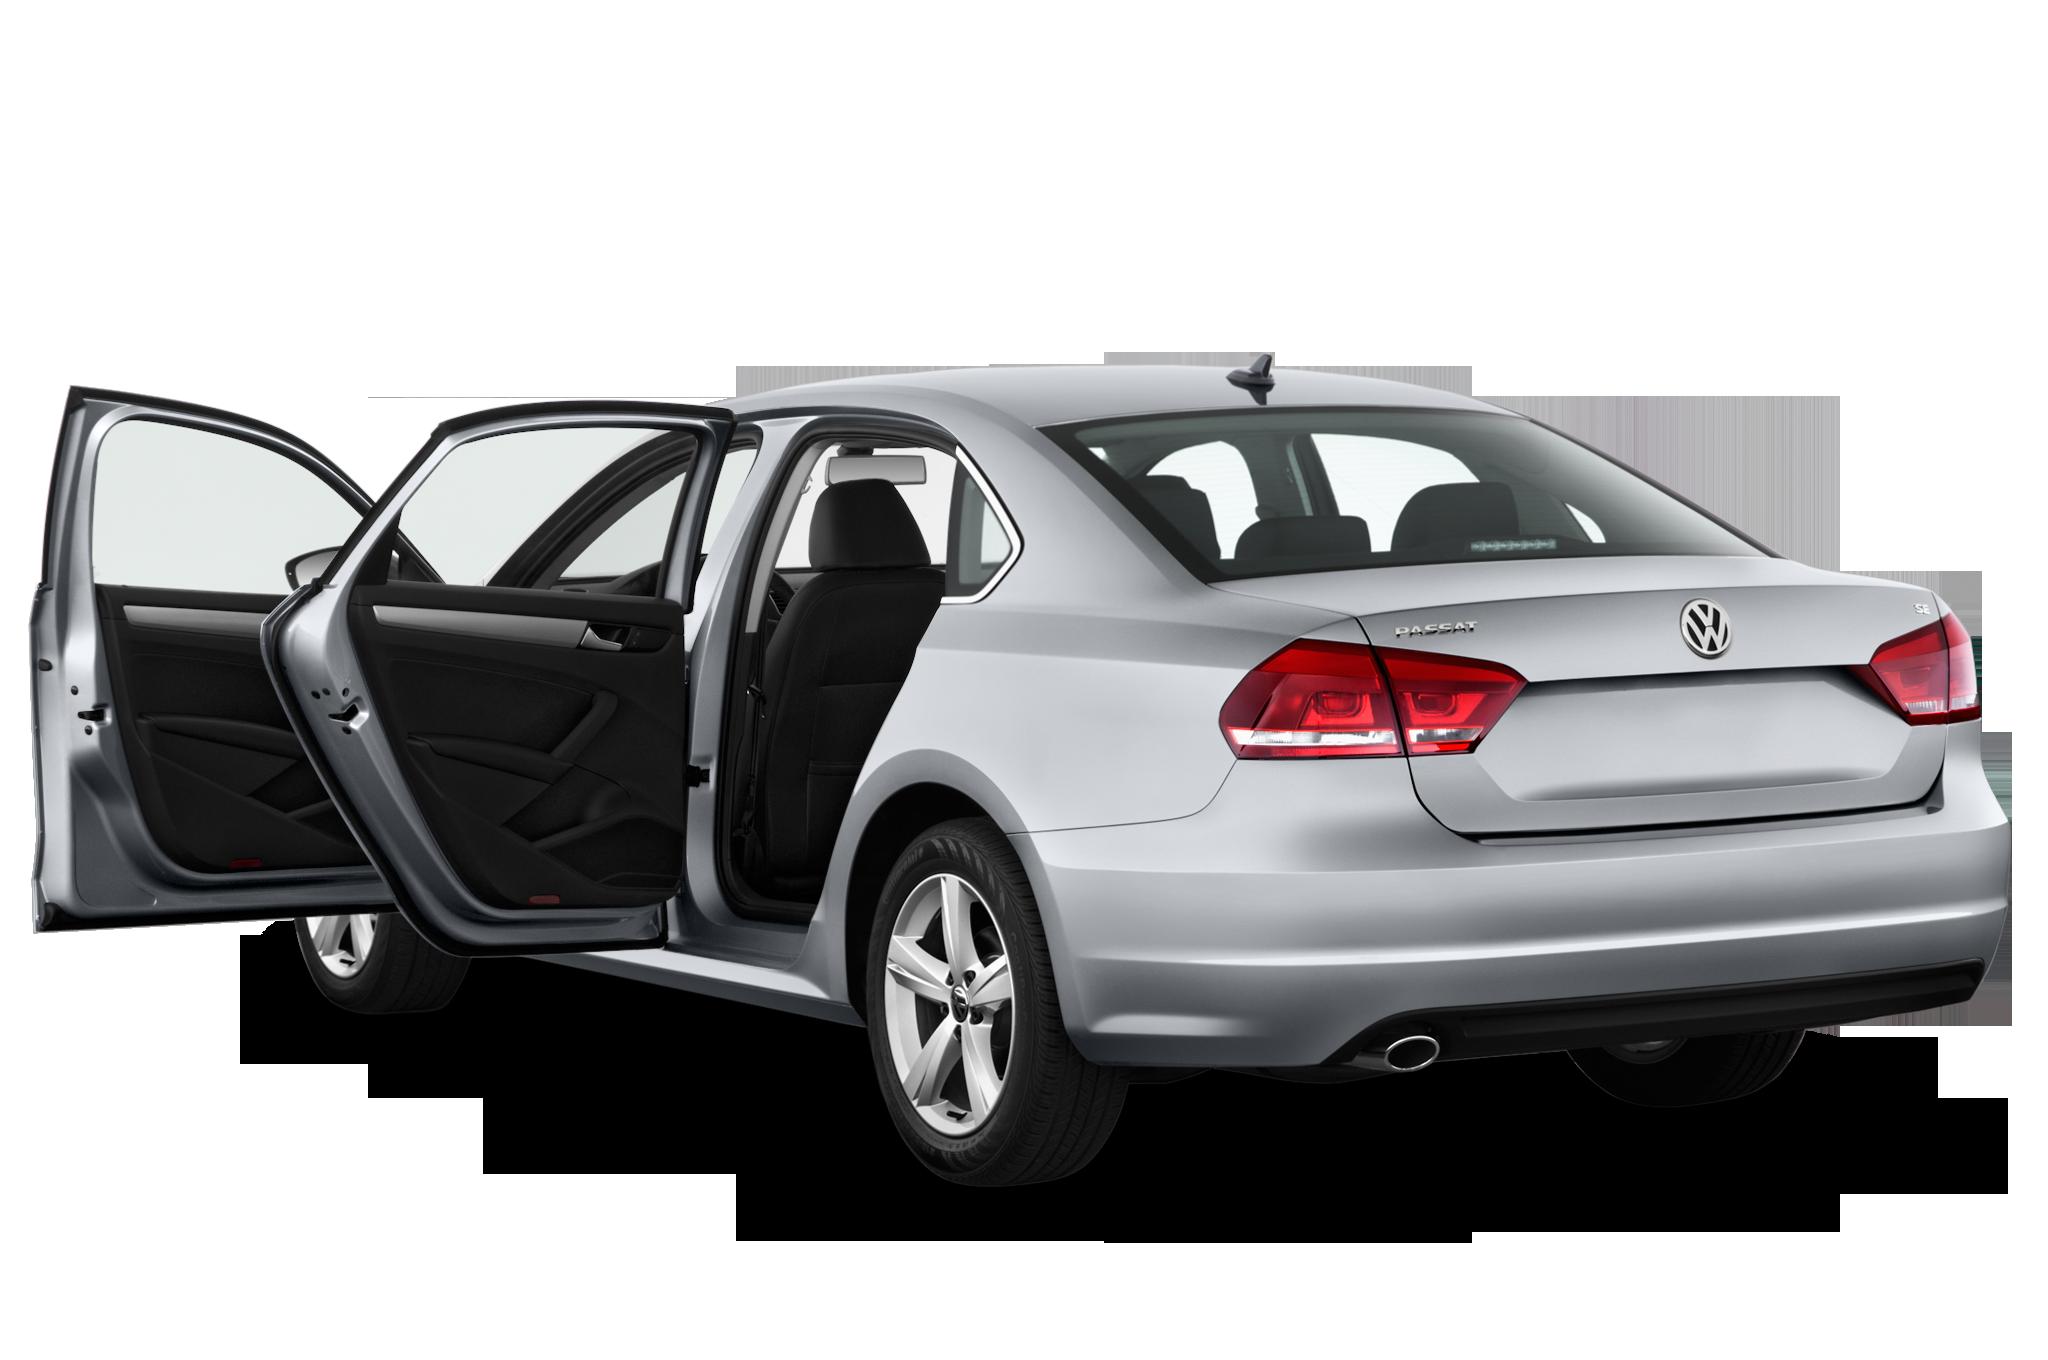 2016 volkswagen passat first drive review automobile magazine. Black Bedroom Furniture Sets. Home Design Ideas